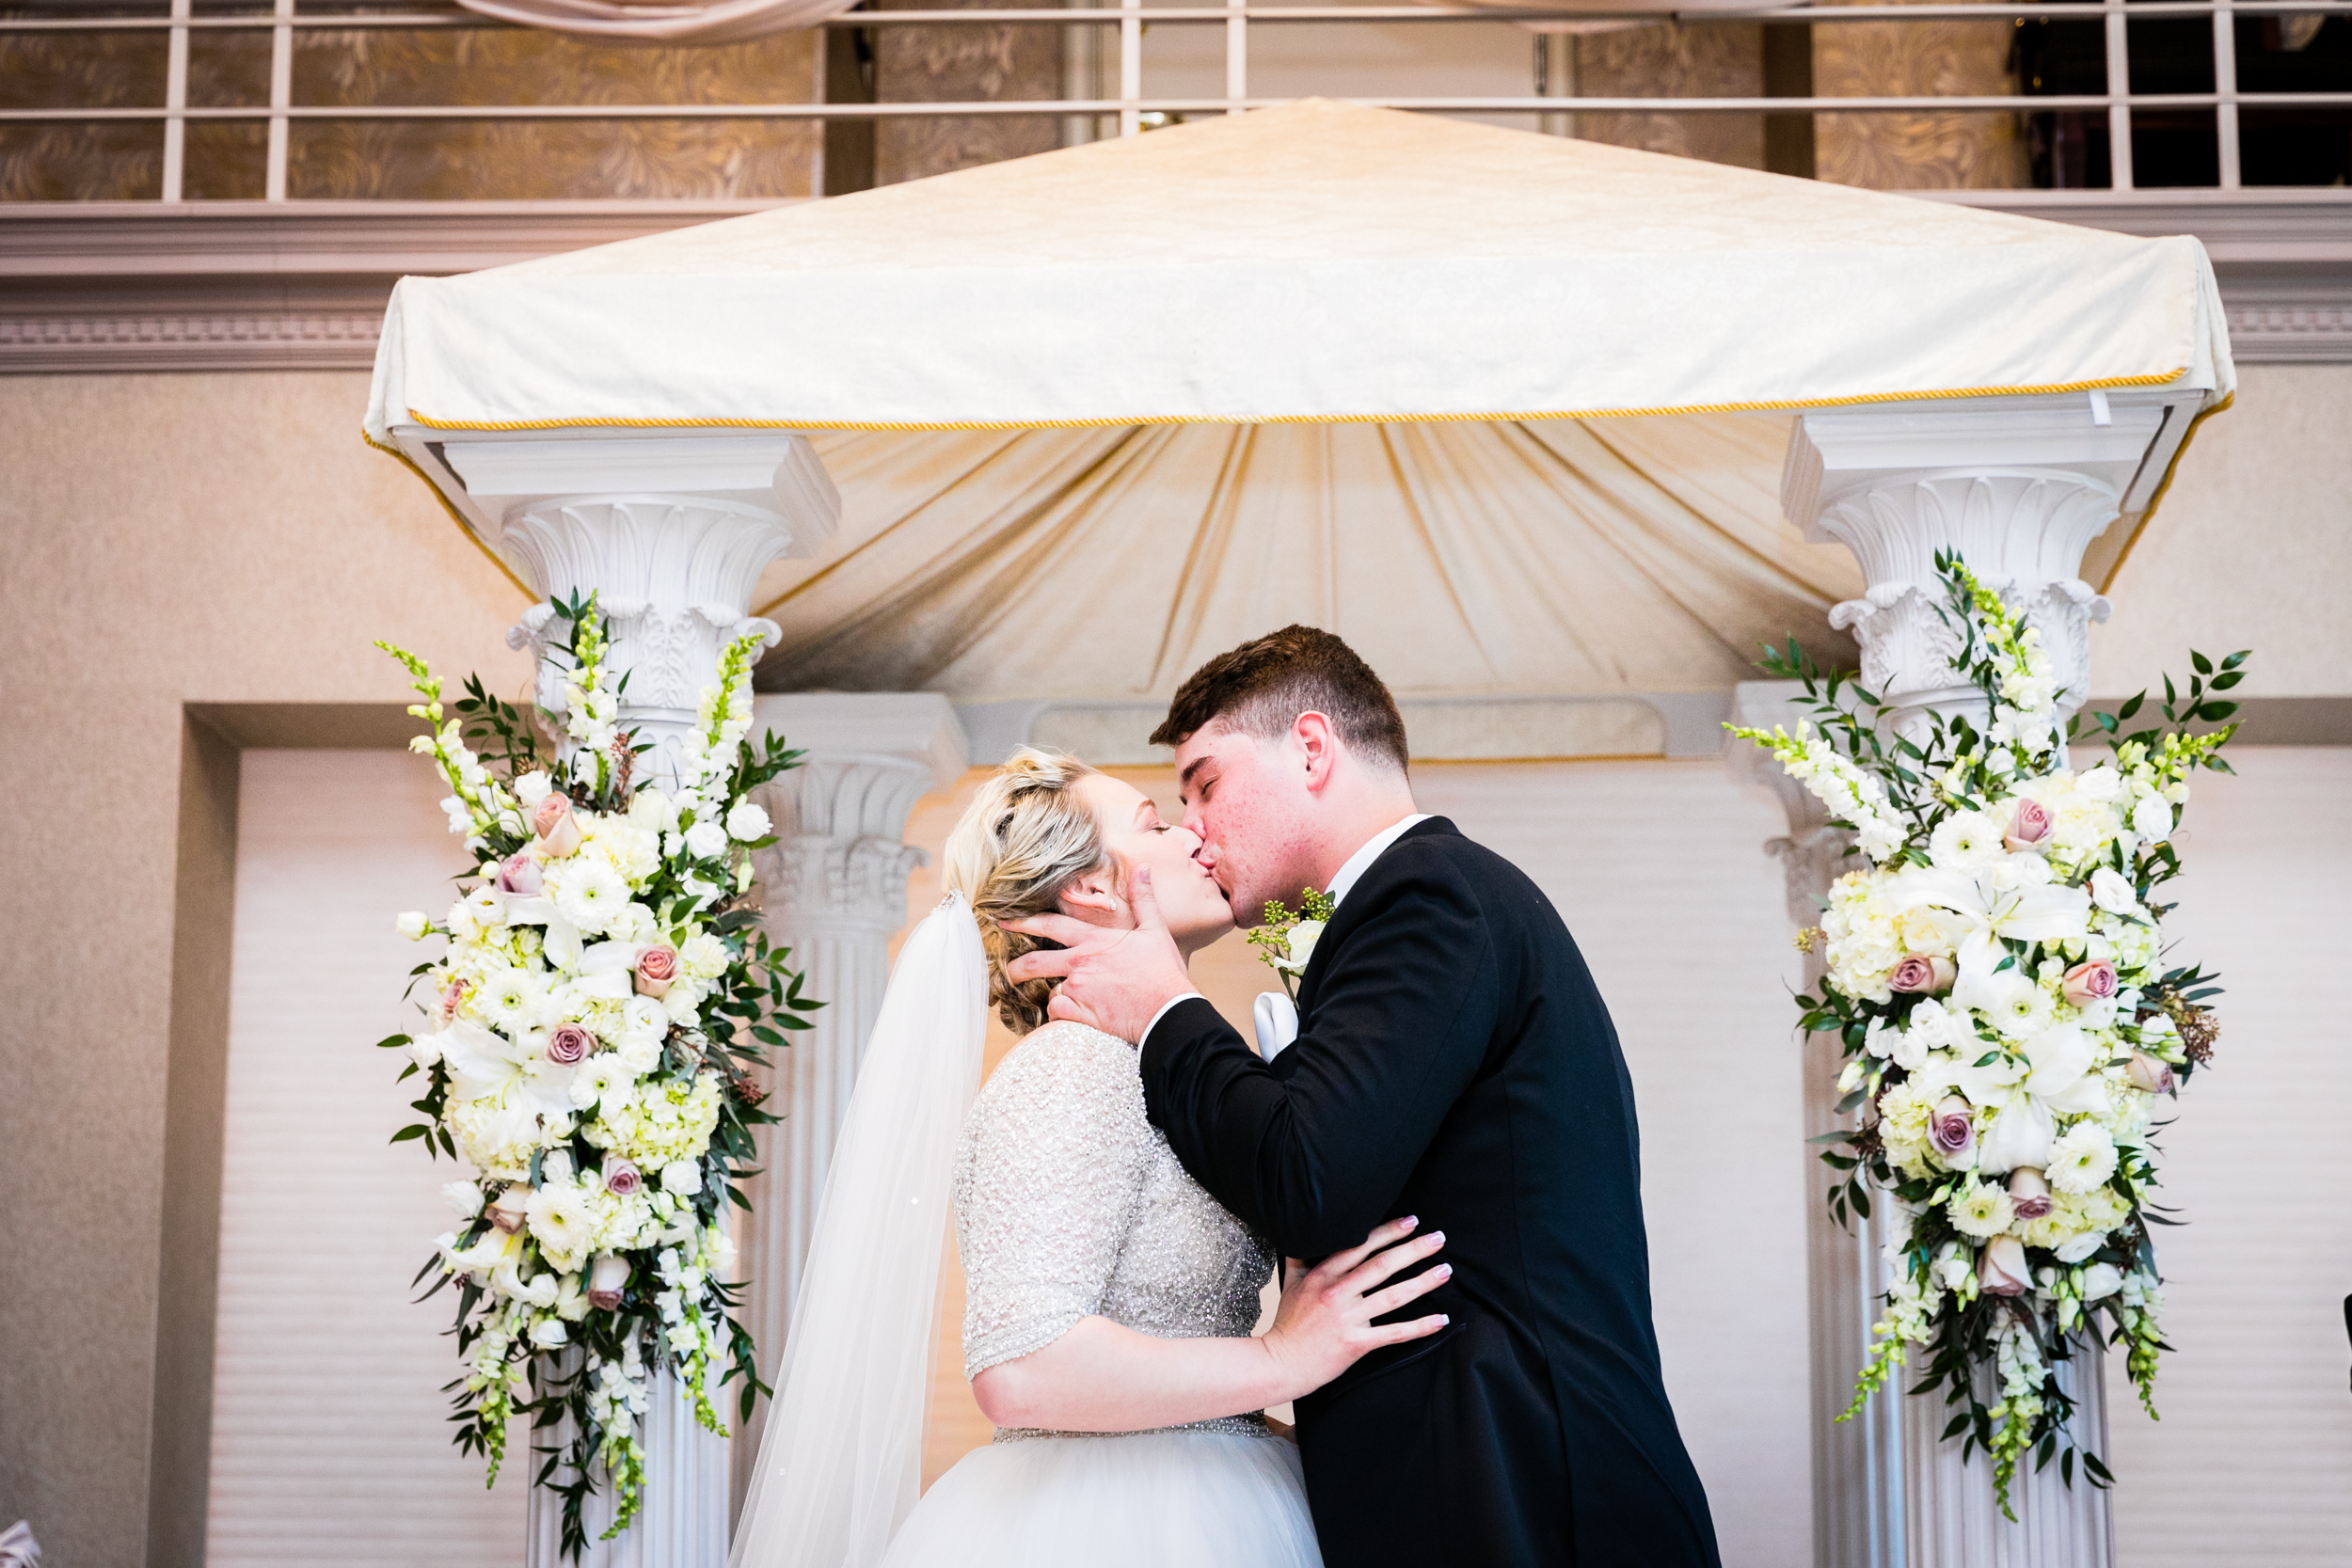 CELEBRATIONS BENSALEM WEDDING PHOTOGRAPHY-56.jpg